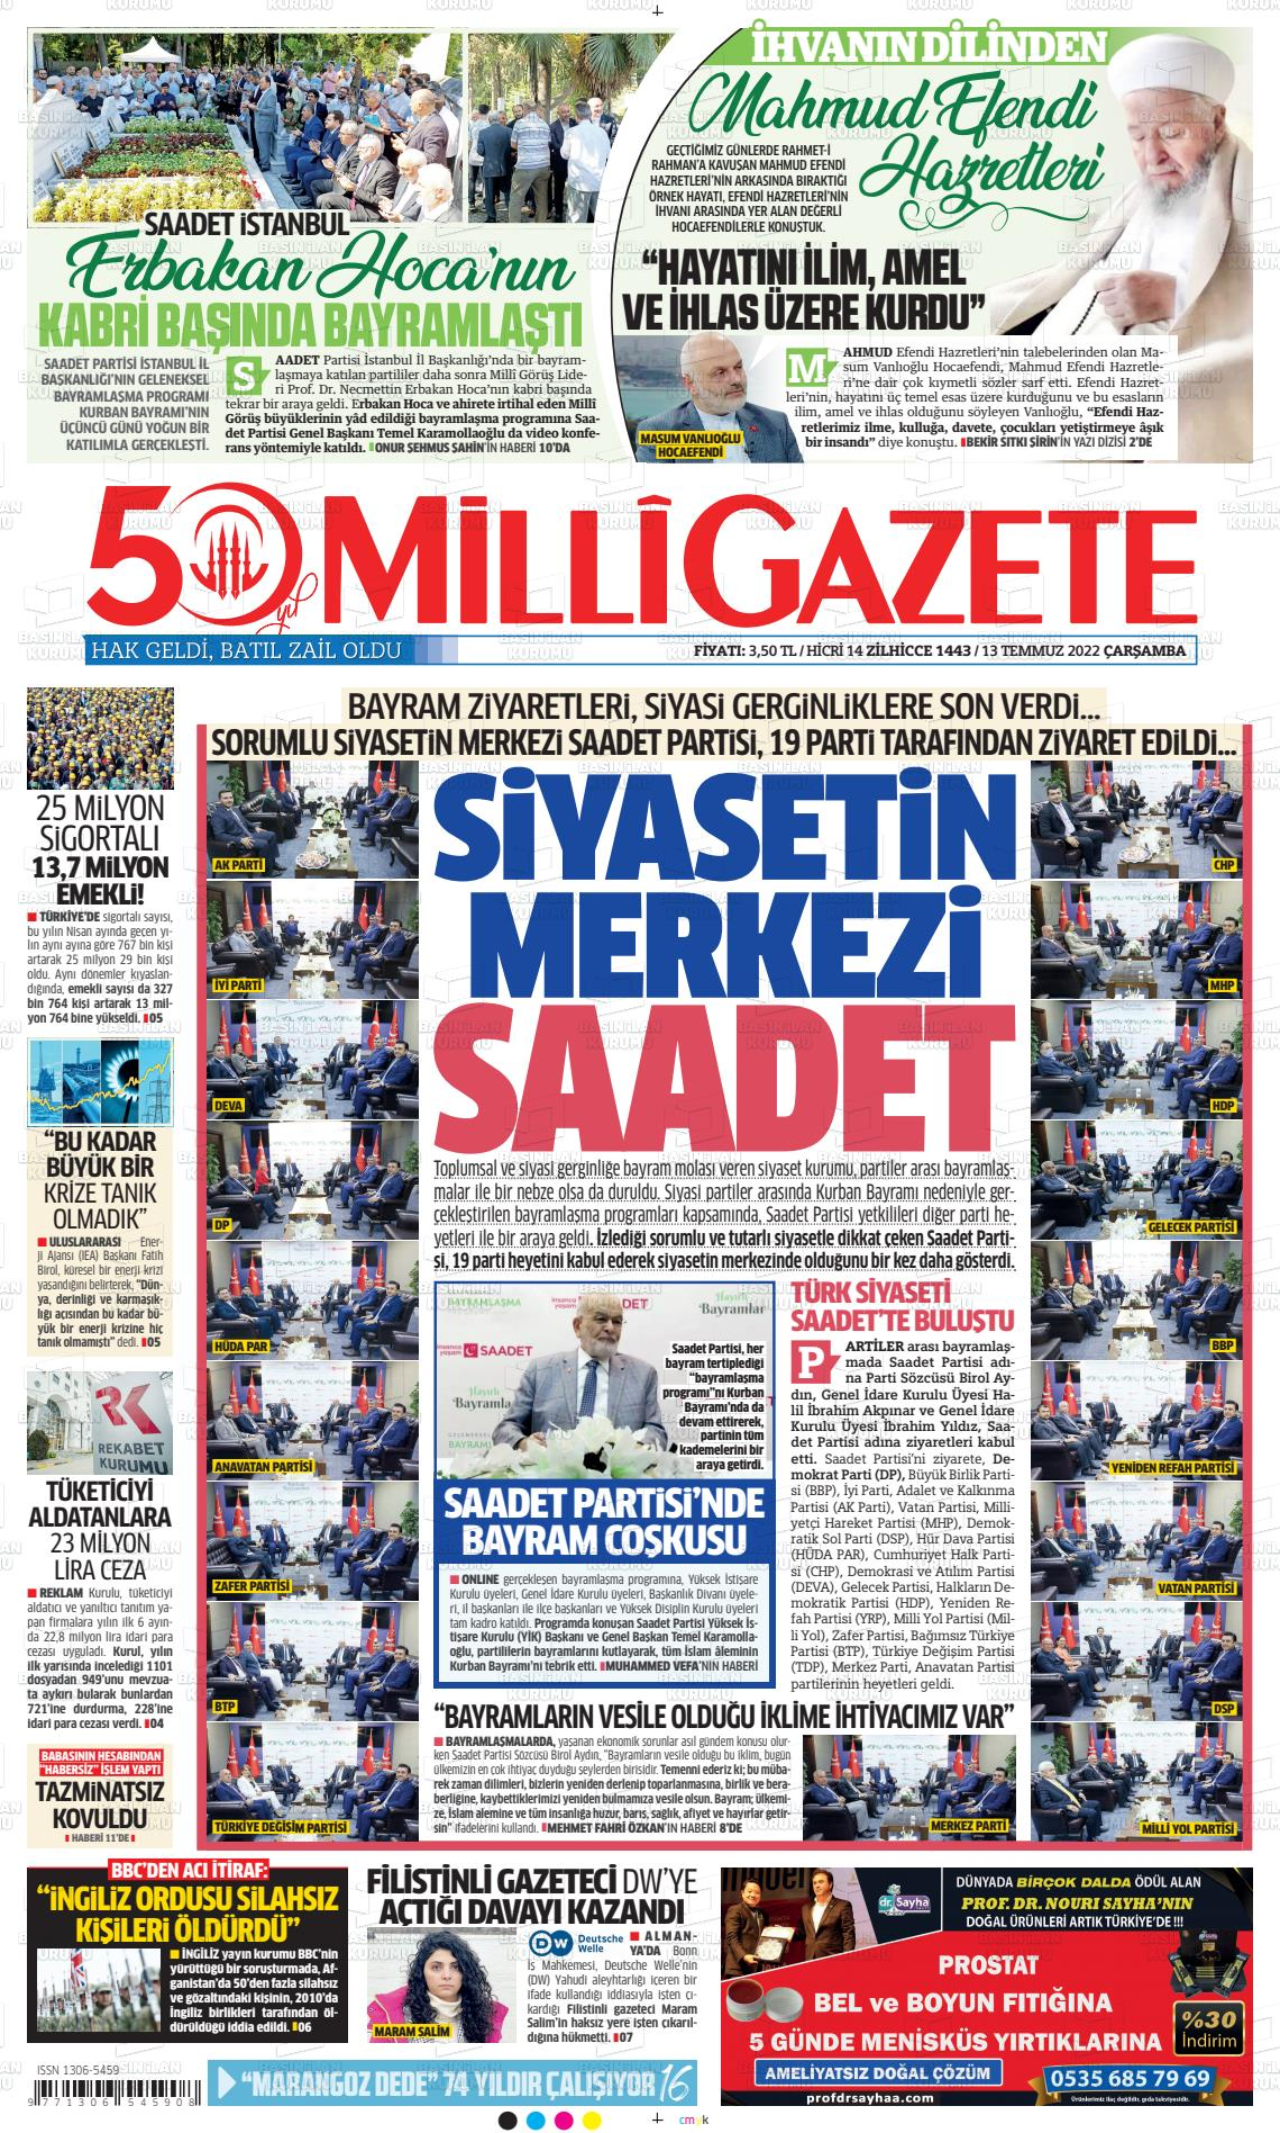 4 Haziran 2020, Perşembe milligazete Gazetesi